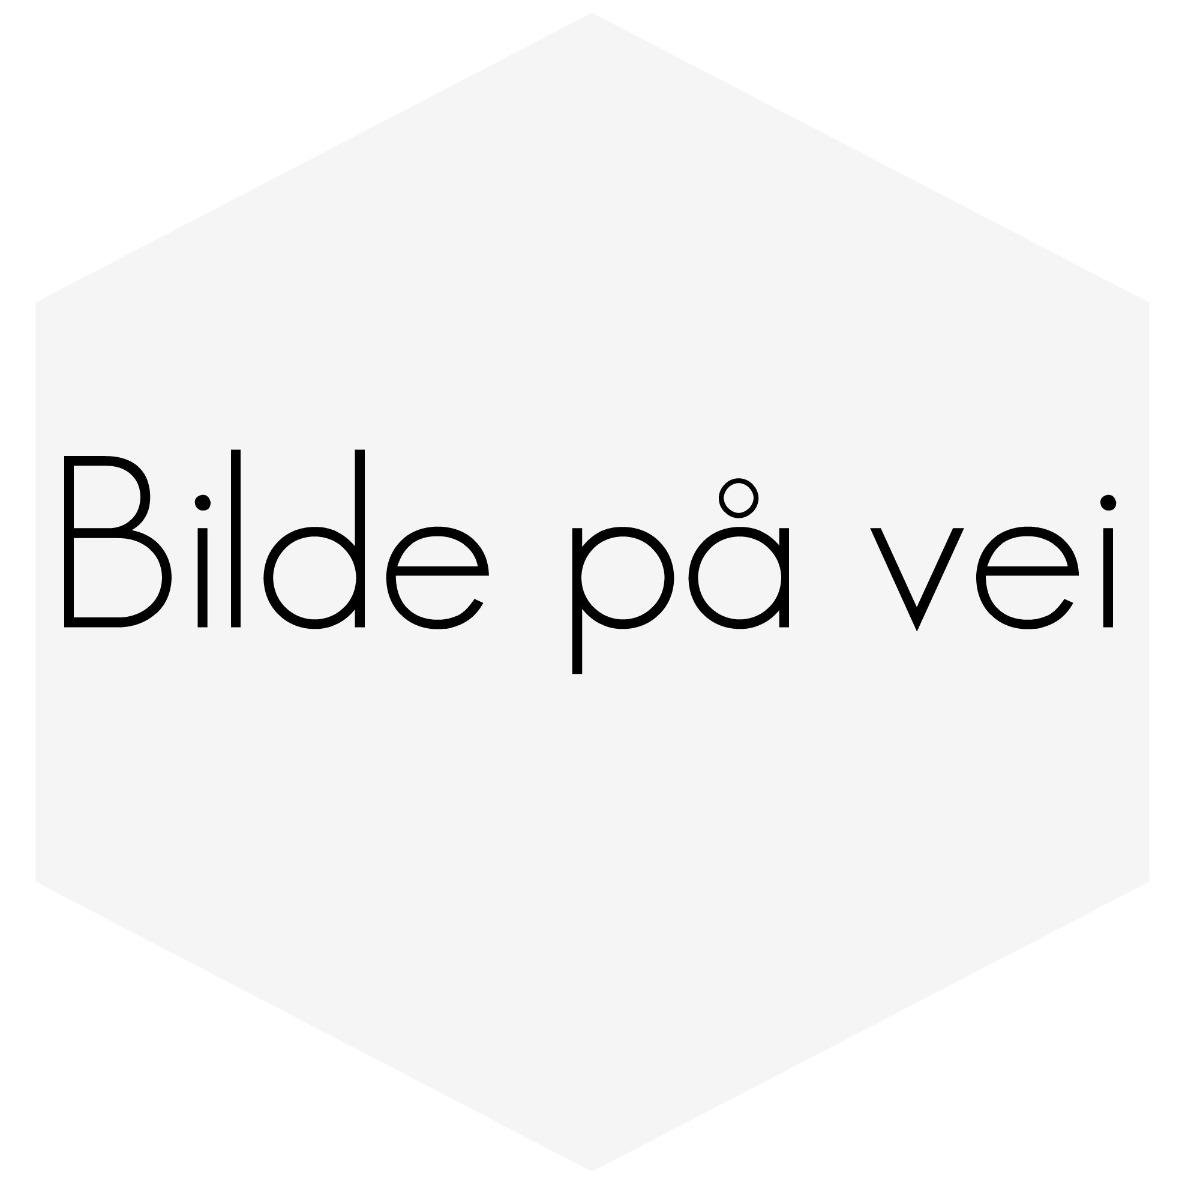 "SILIKONSLANGE SVART FLEKSIBEL 1,75"" (45MM)"